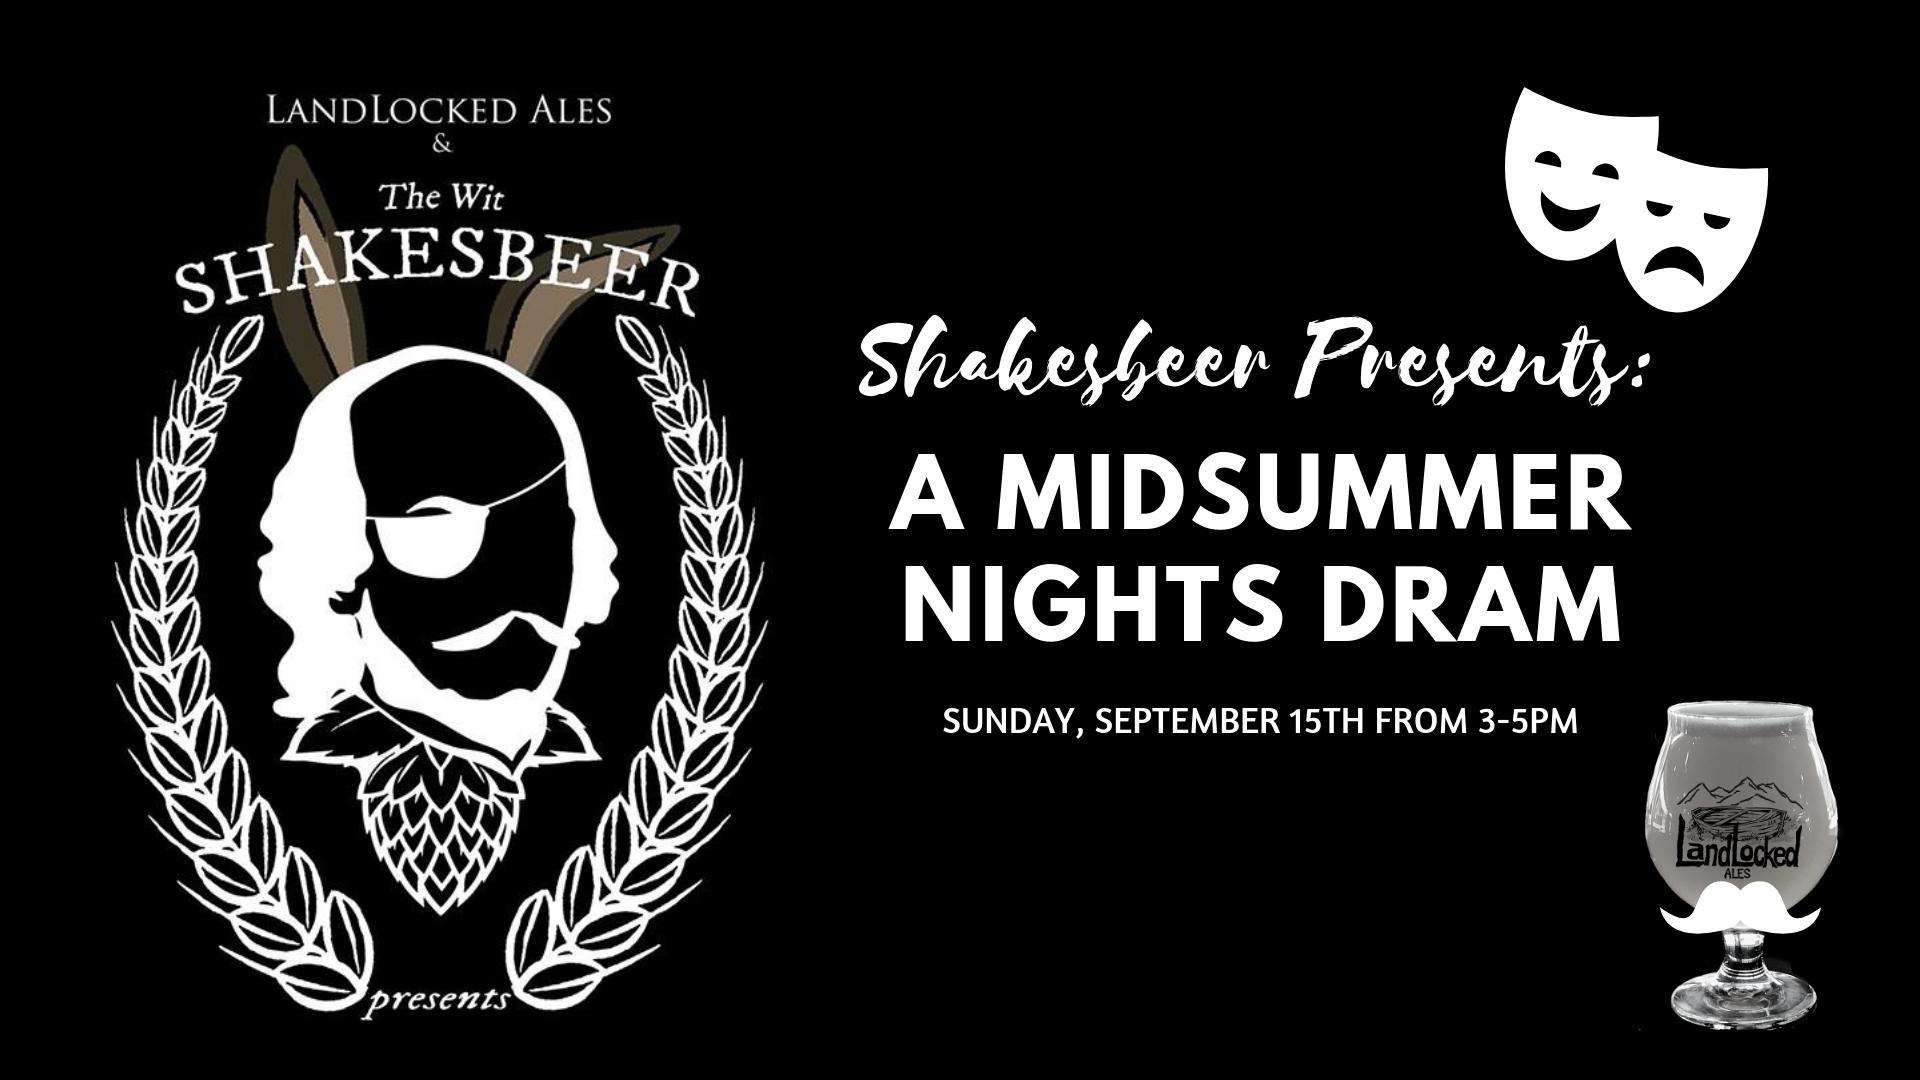 shakesbeer facebook event.png